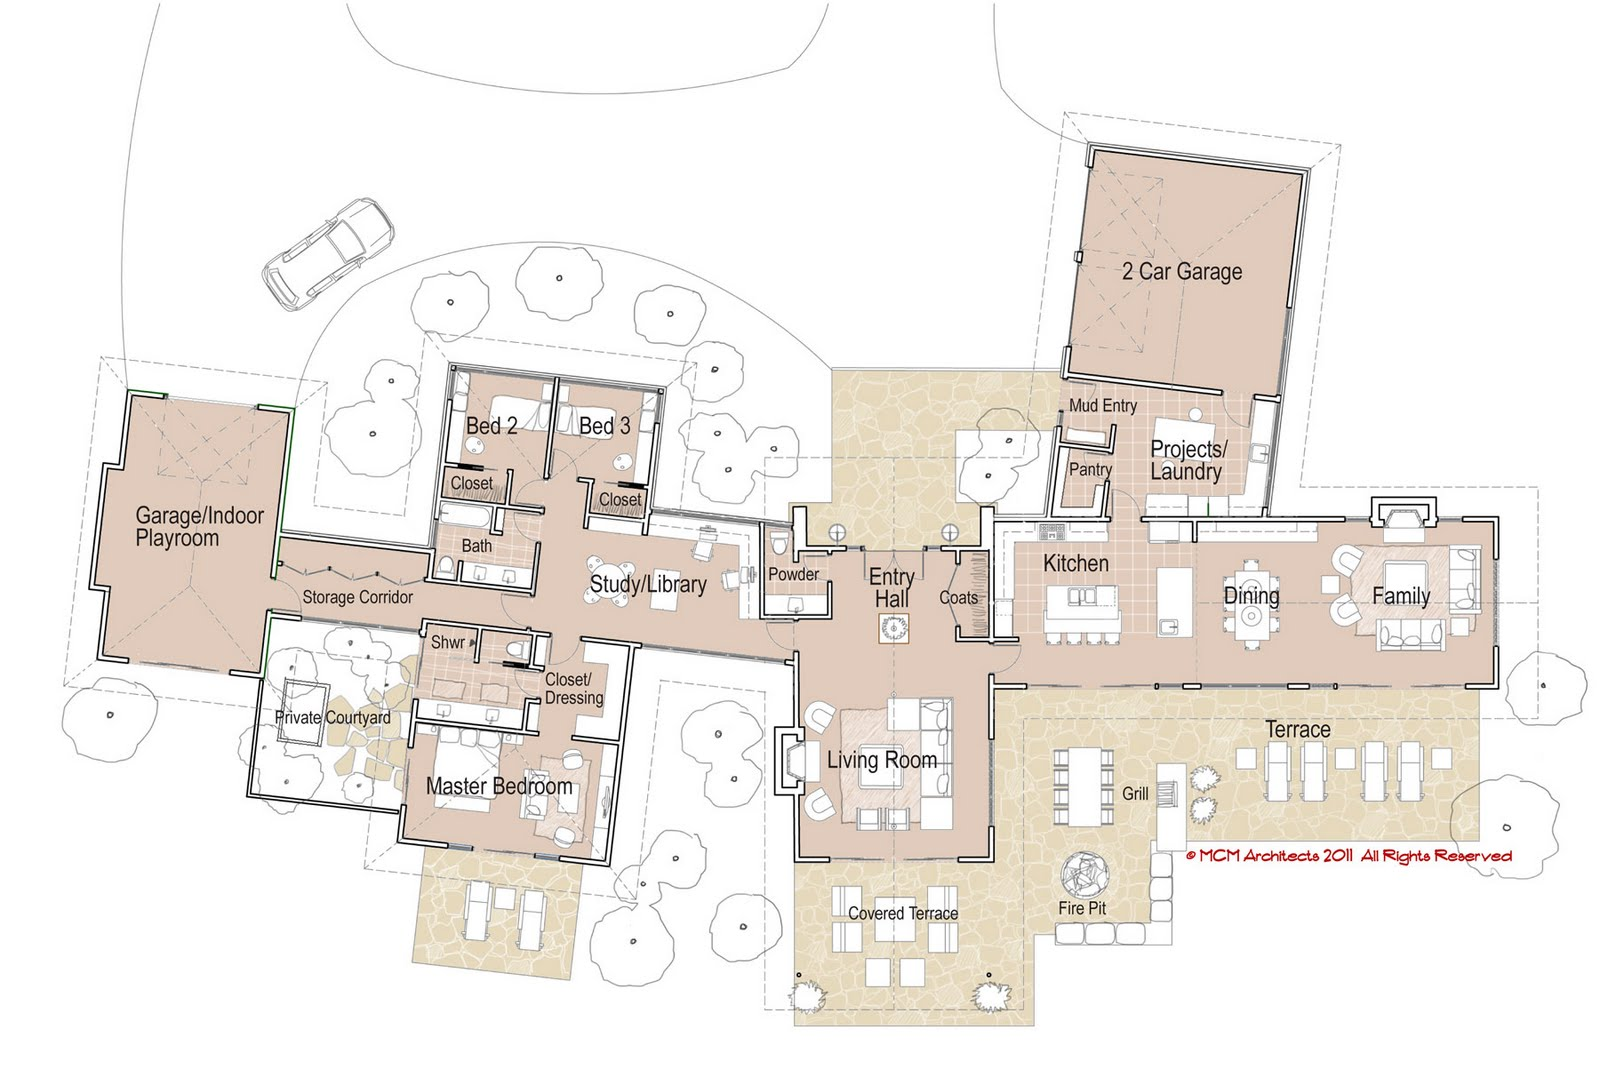 Modern House Plan 1 title=